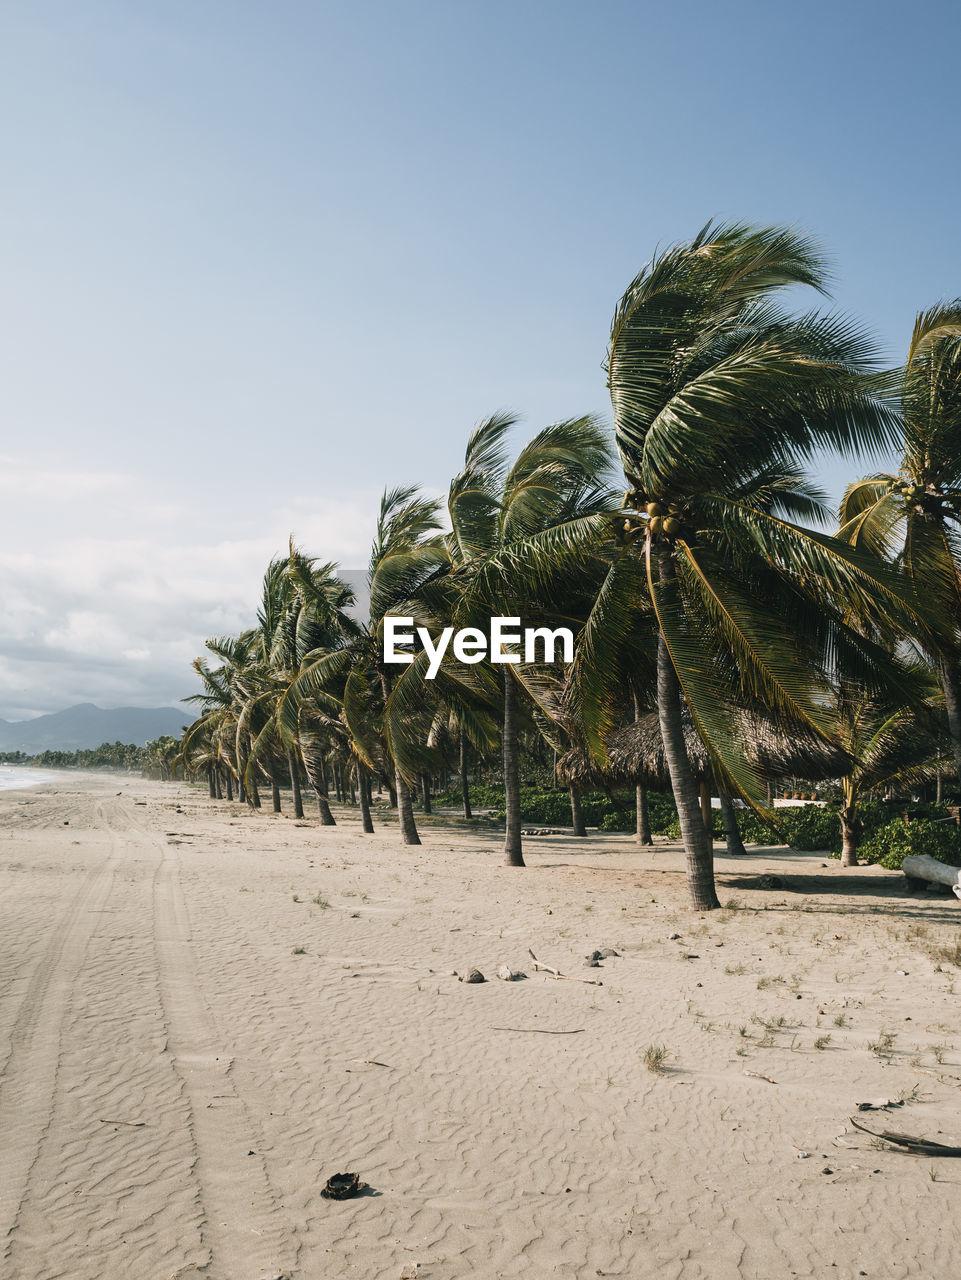 PALM TREES ON SAND AGAINST SKY